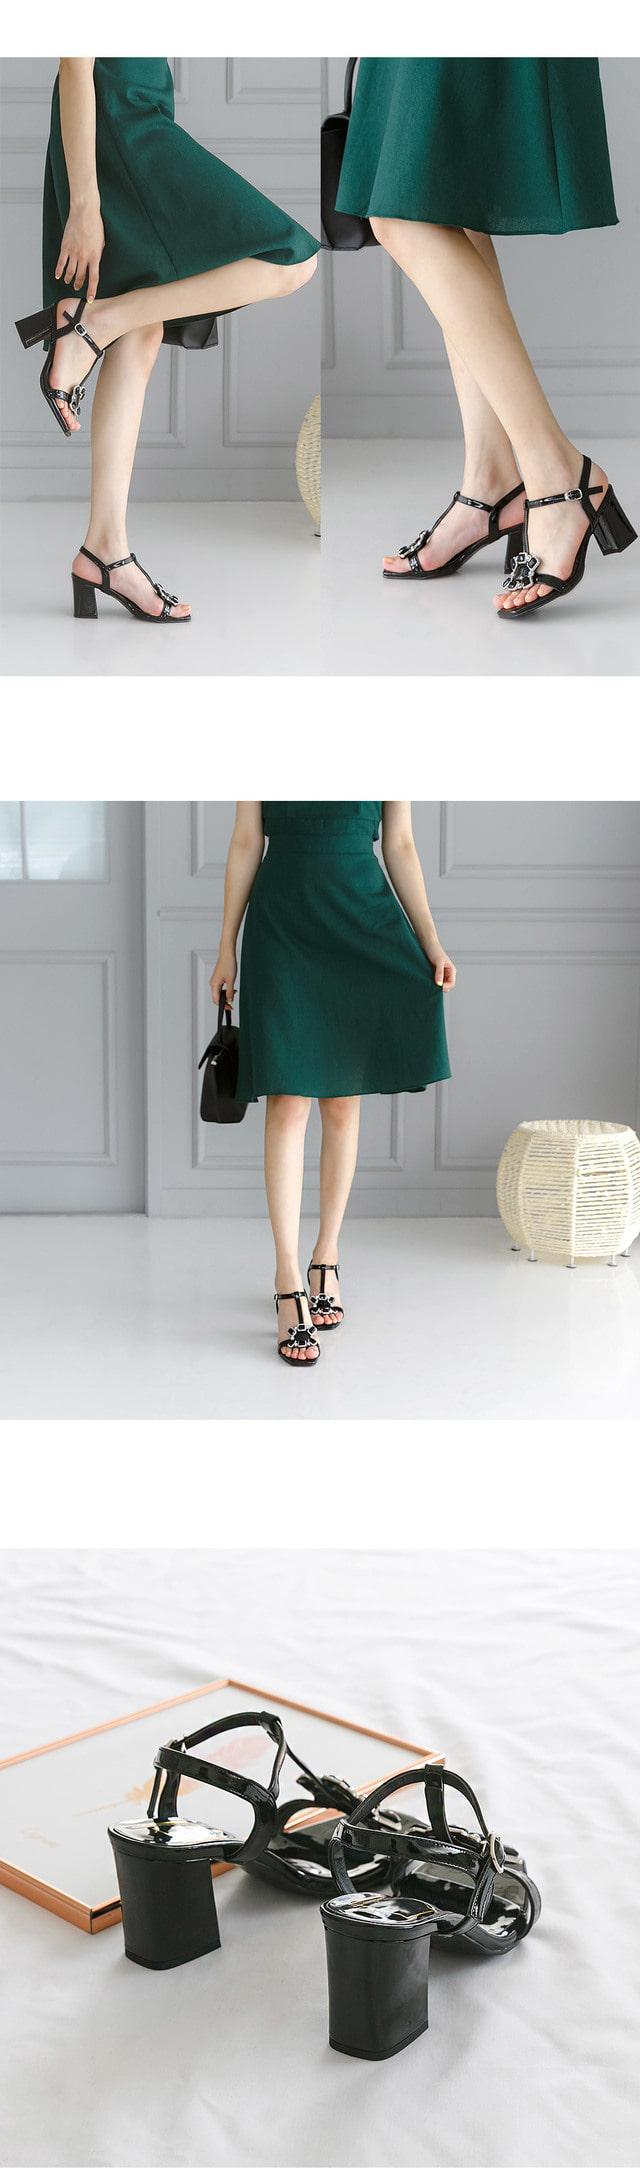 Gallon strap sandals 7cm